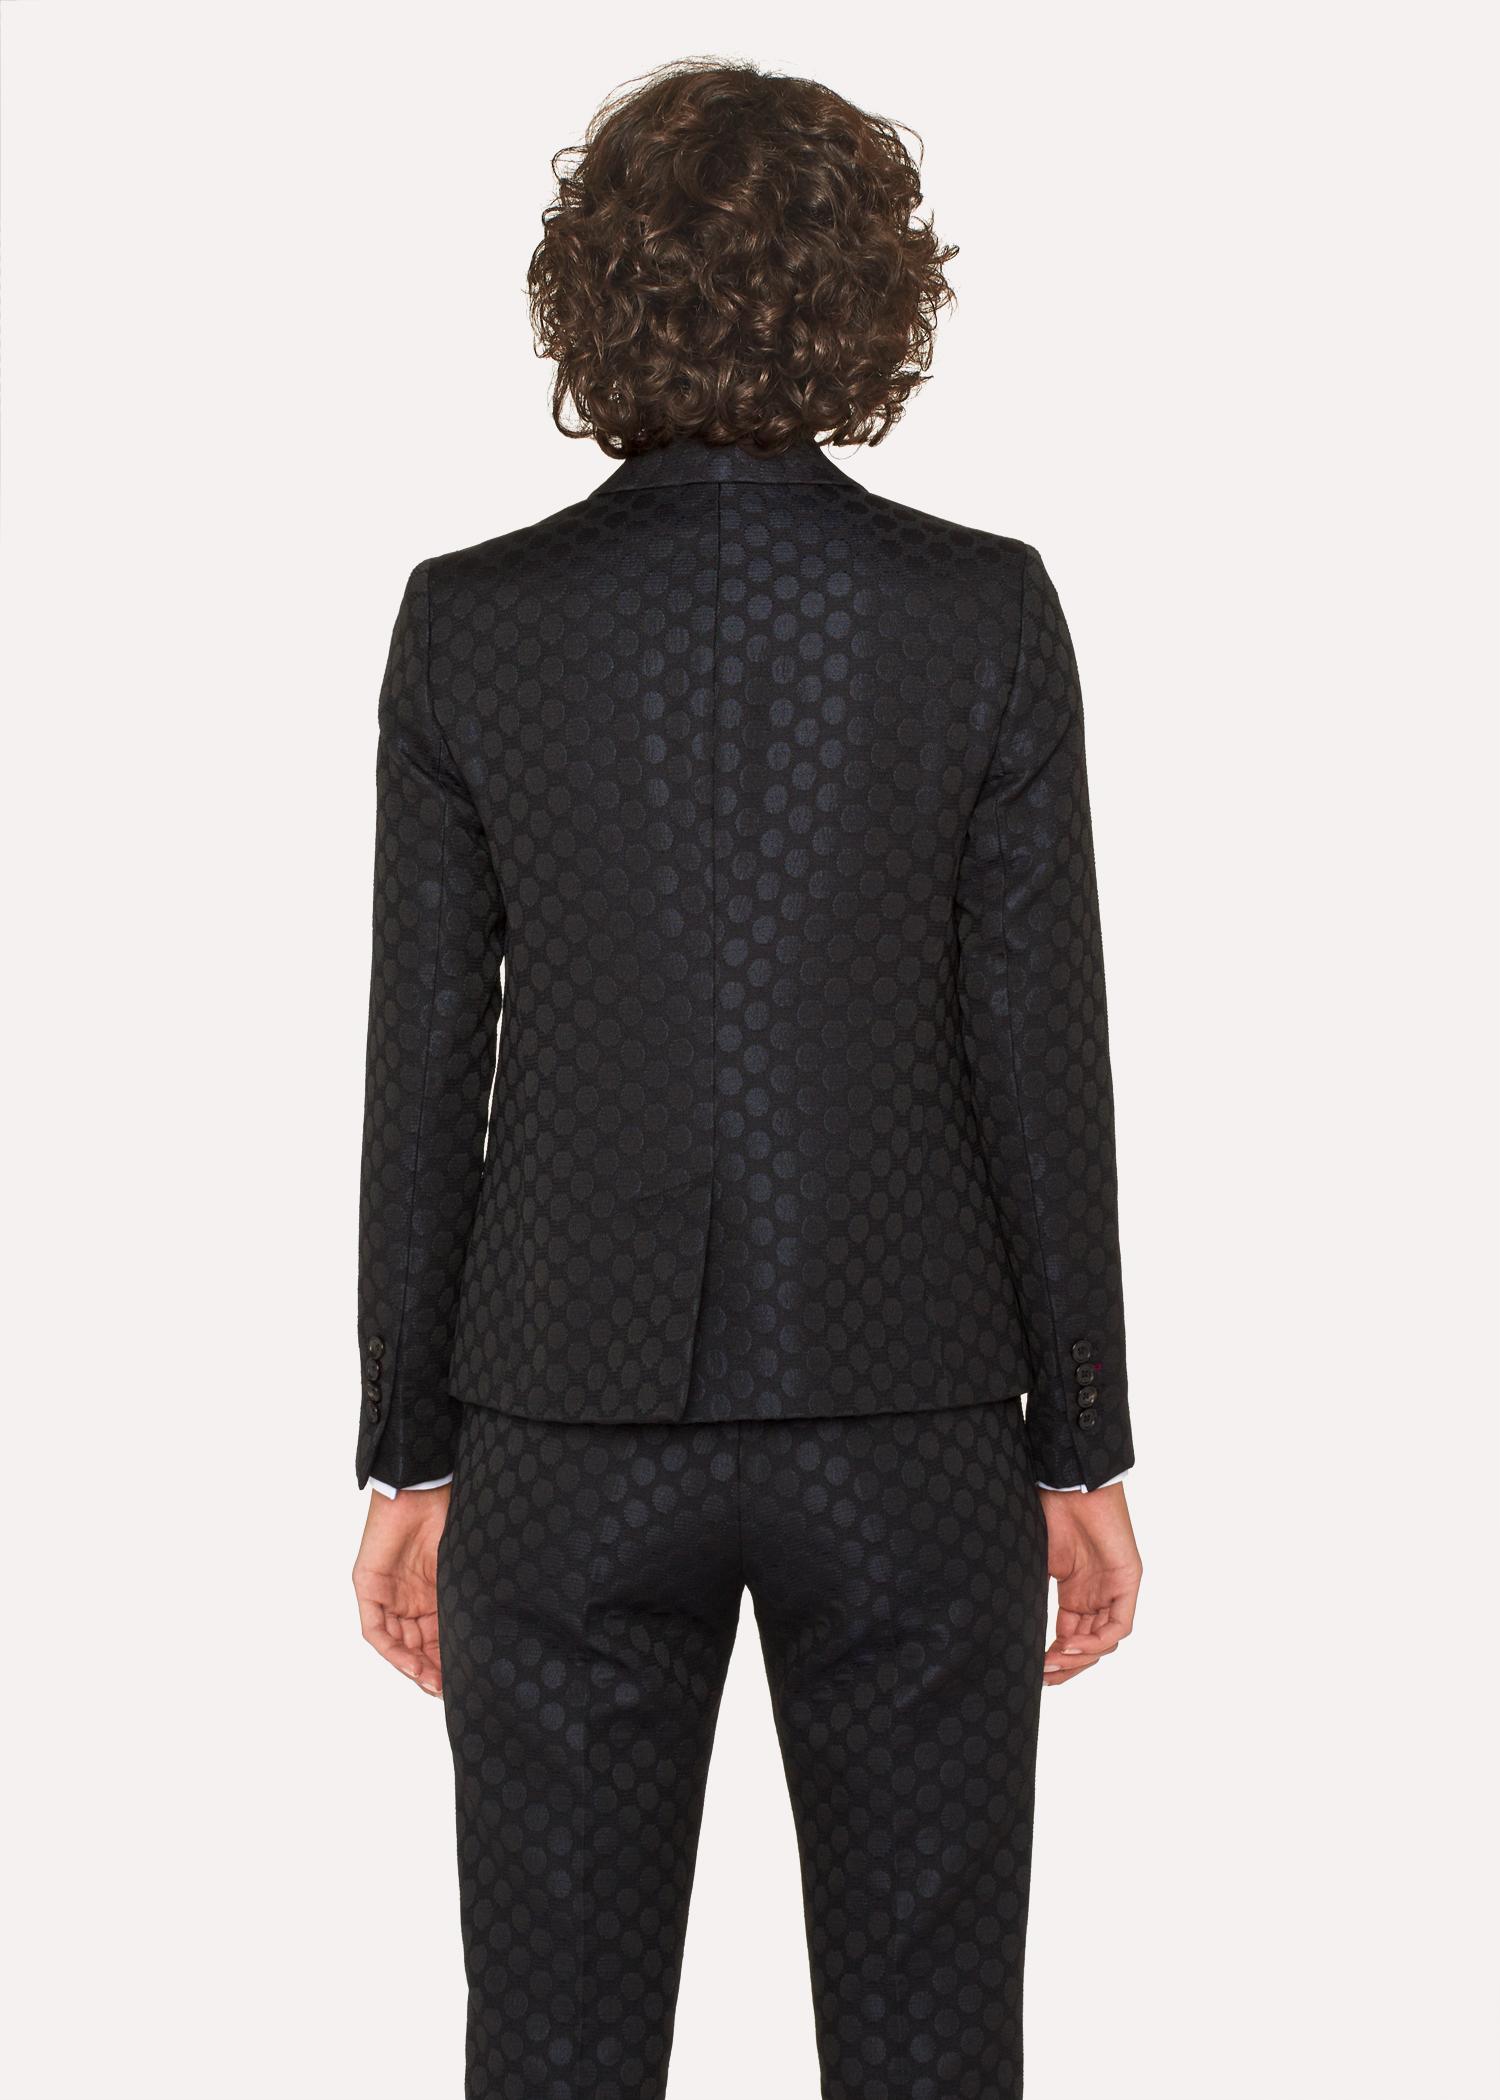 Women S Black Polka Dot Jacquard Double Breasted Blazer Paul Smith Us